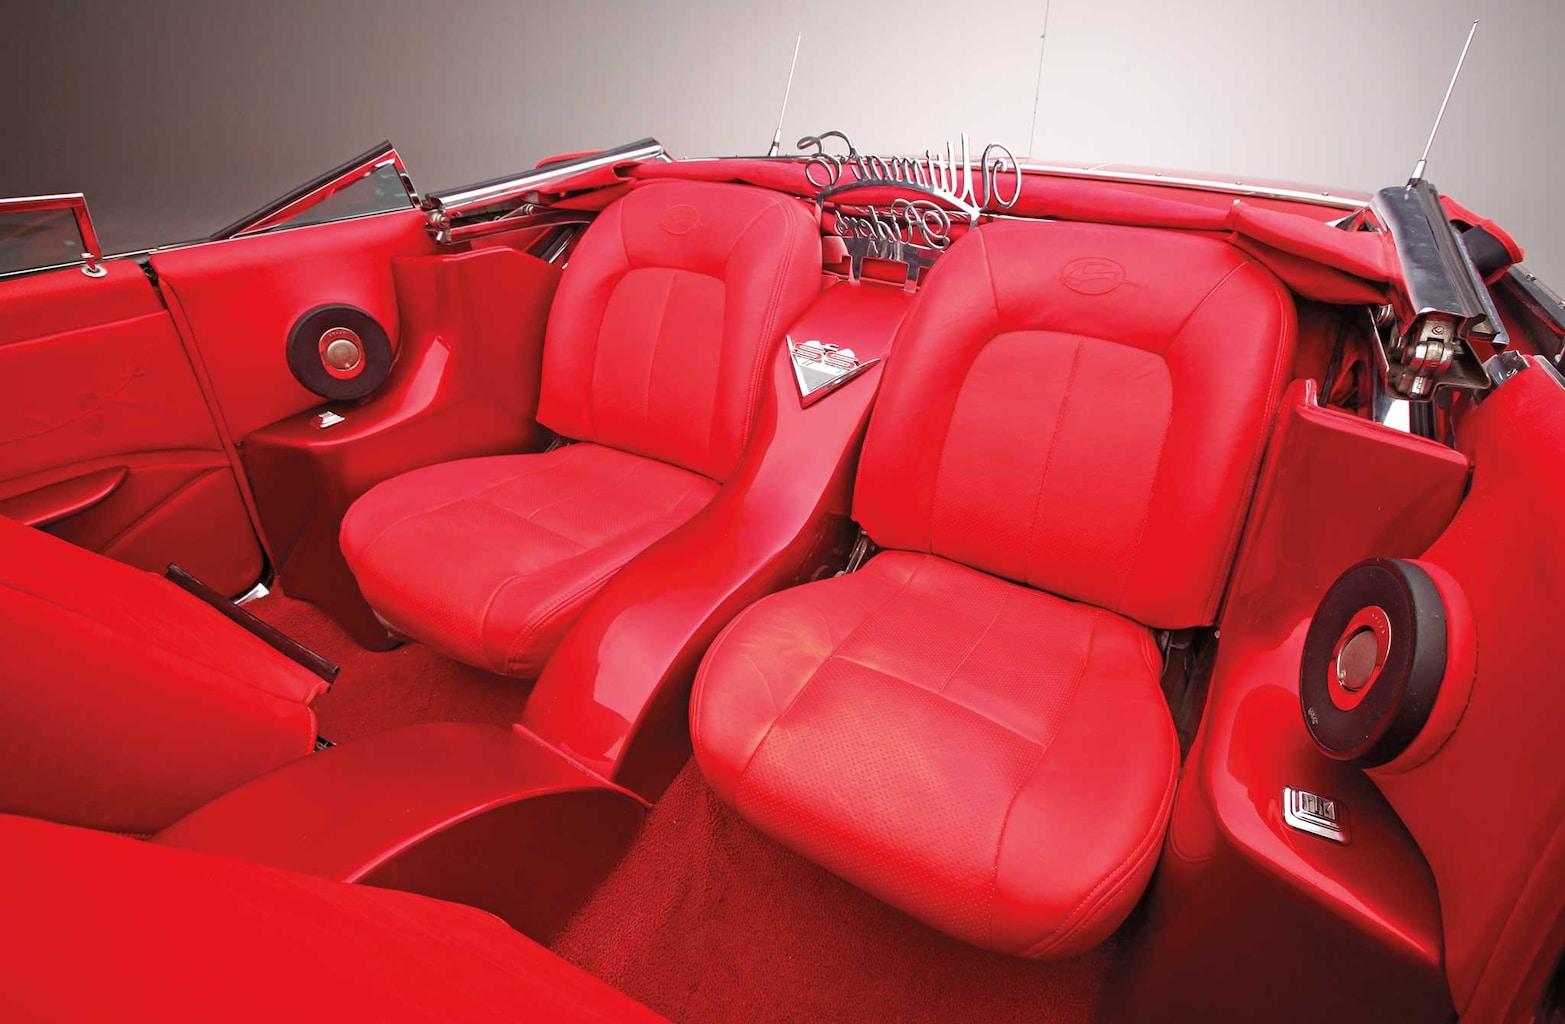 004 1961 chevrolet impala convertible lexus seats